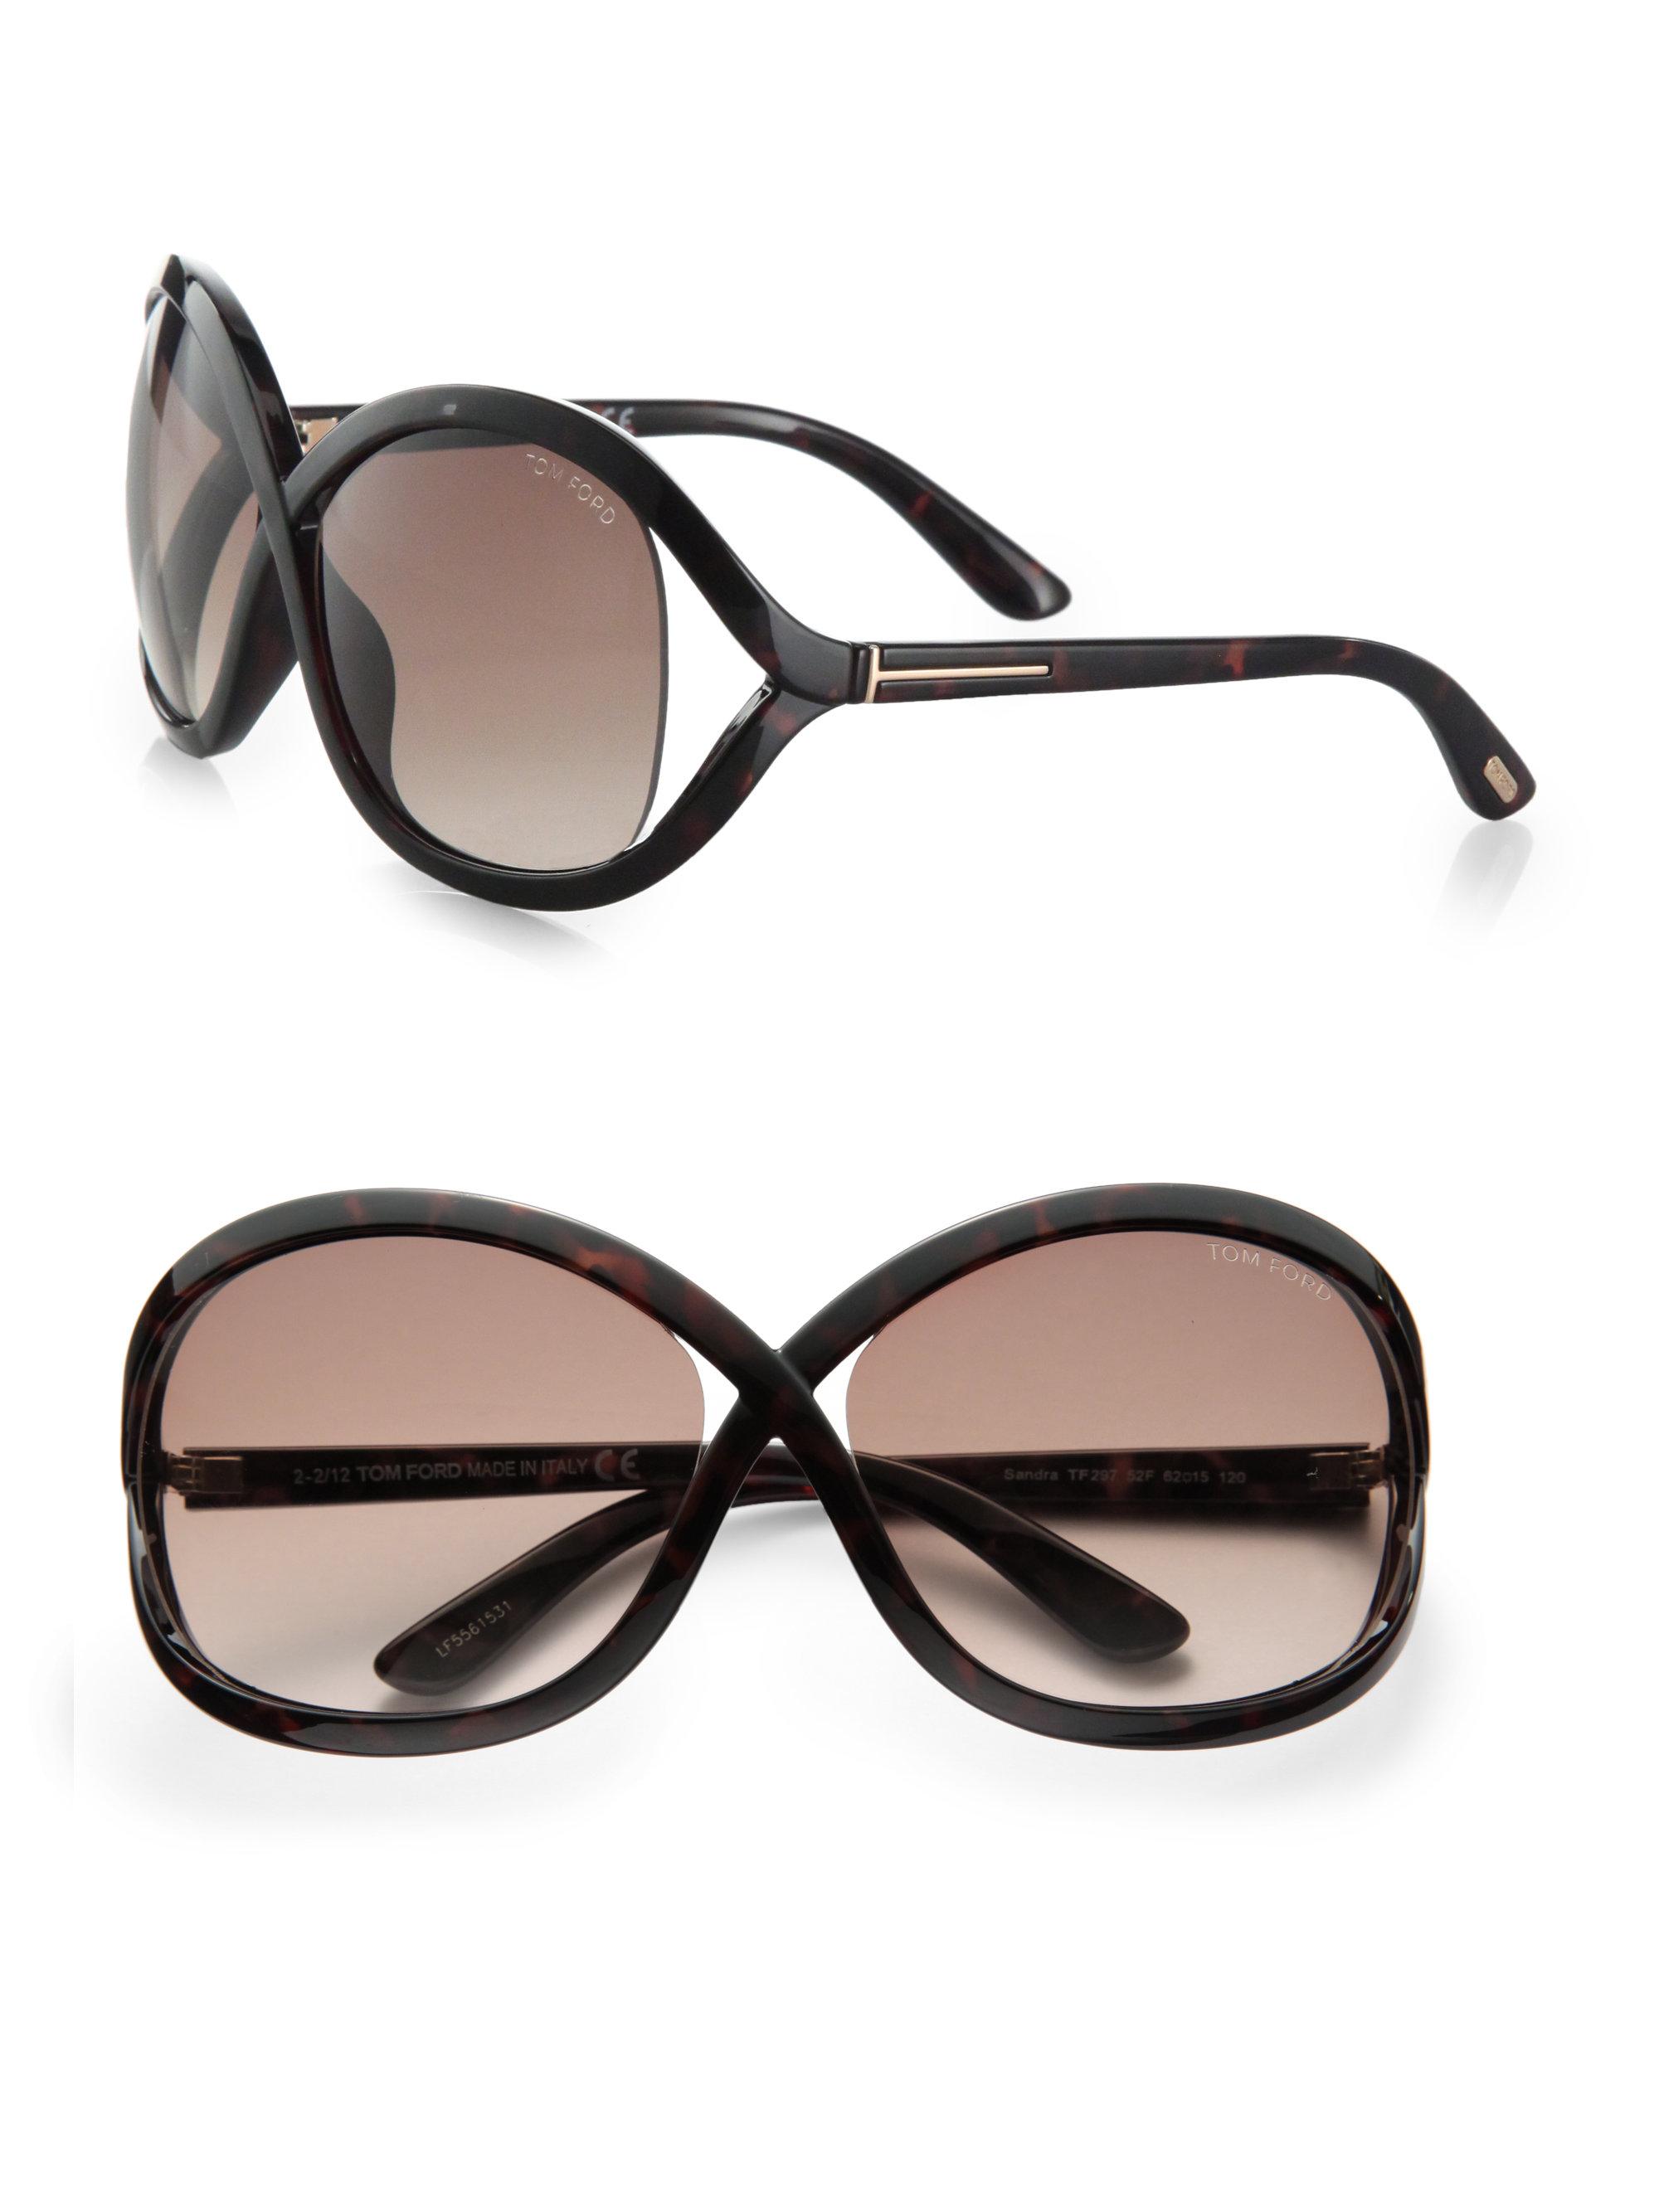 516b240fe02 Lyst - Tom Ford Sandra Acetate Square Crossover Sunglasses in Black